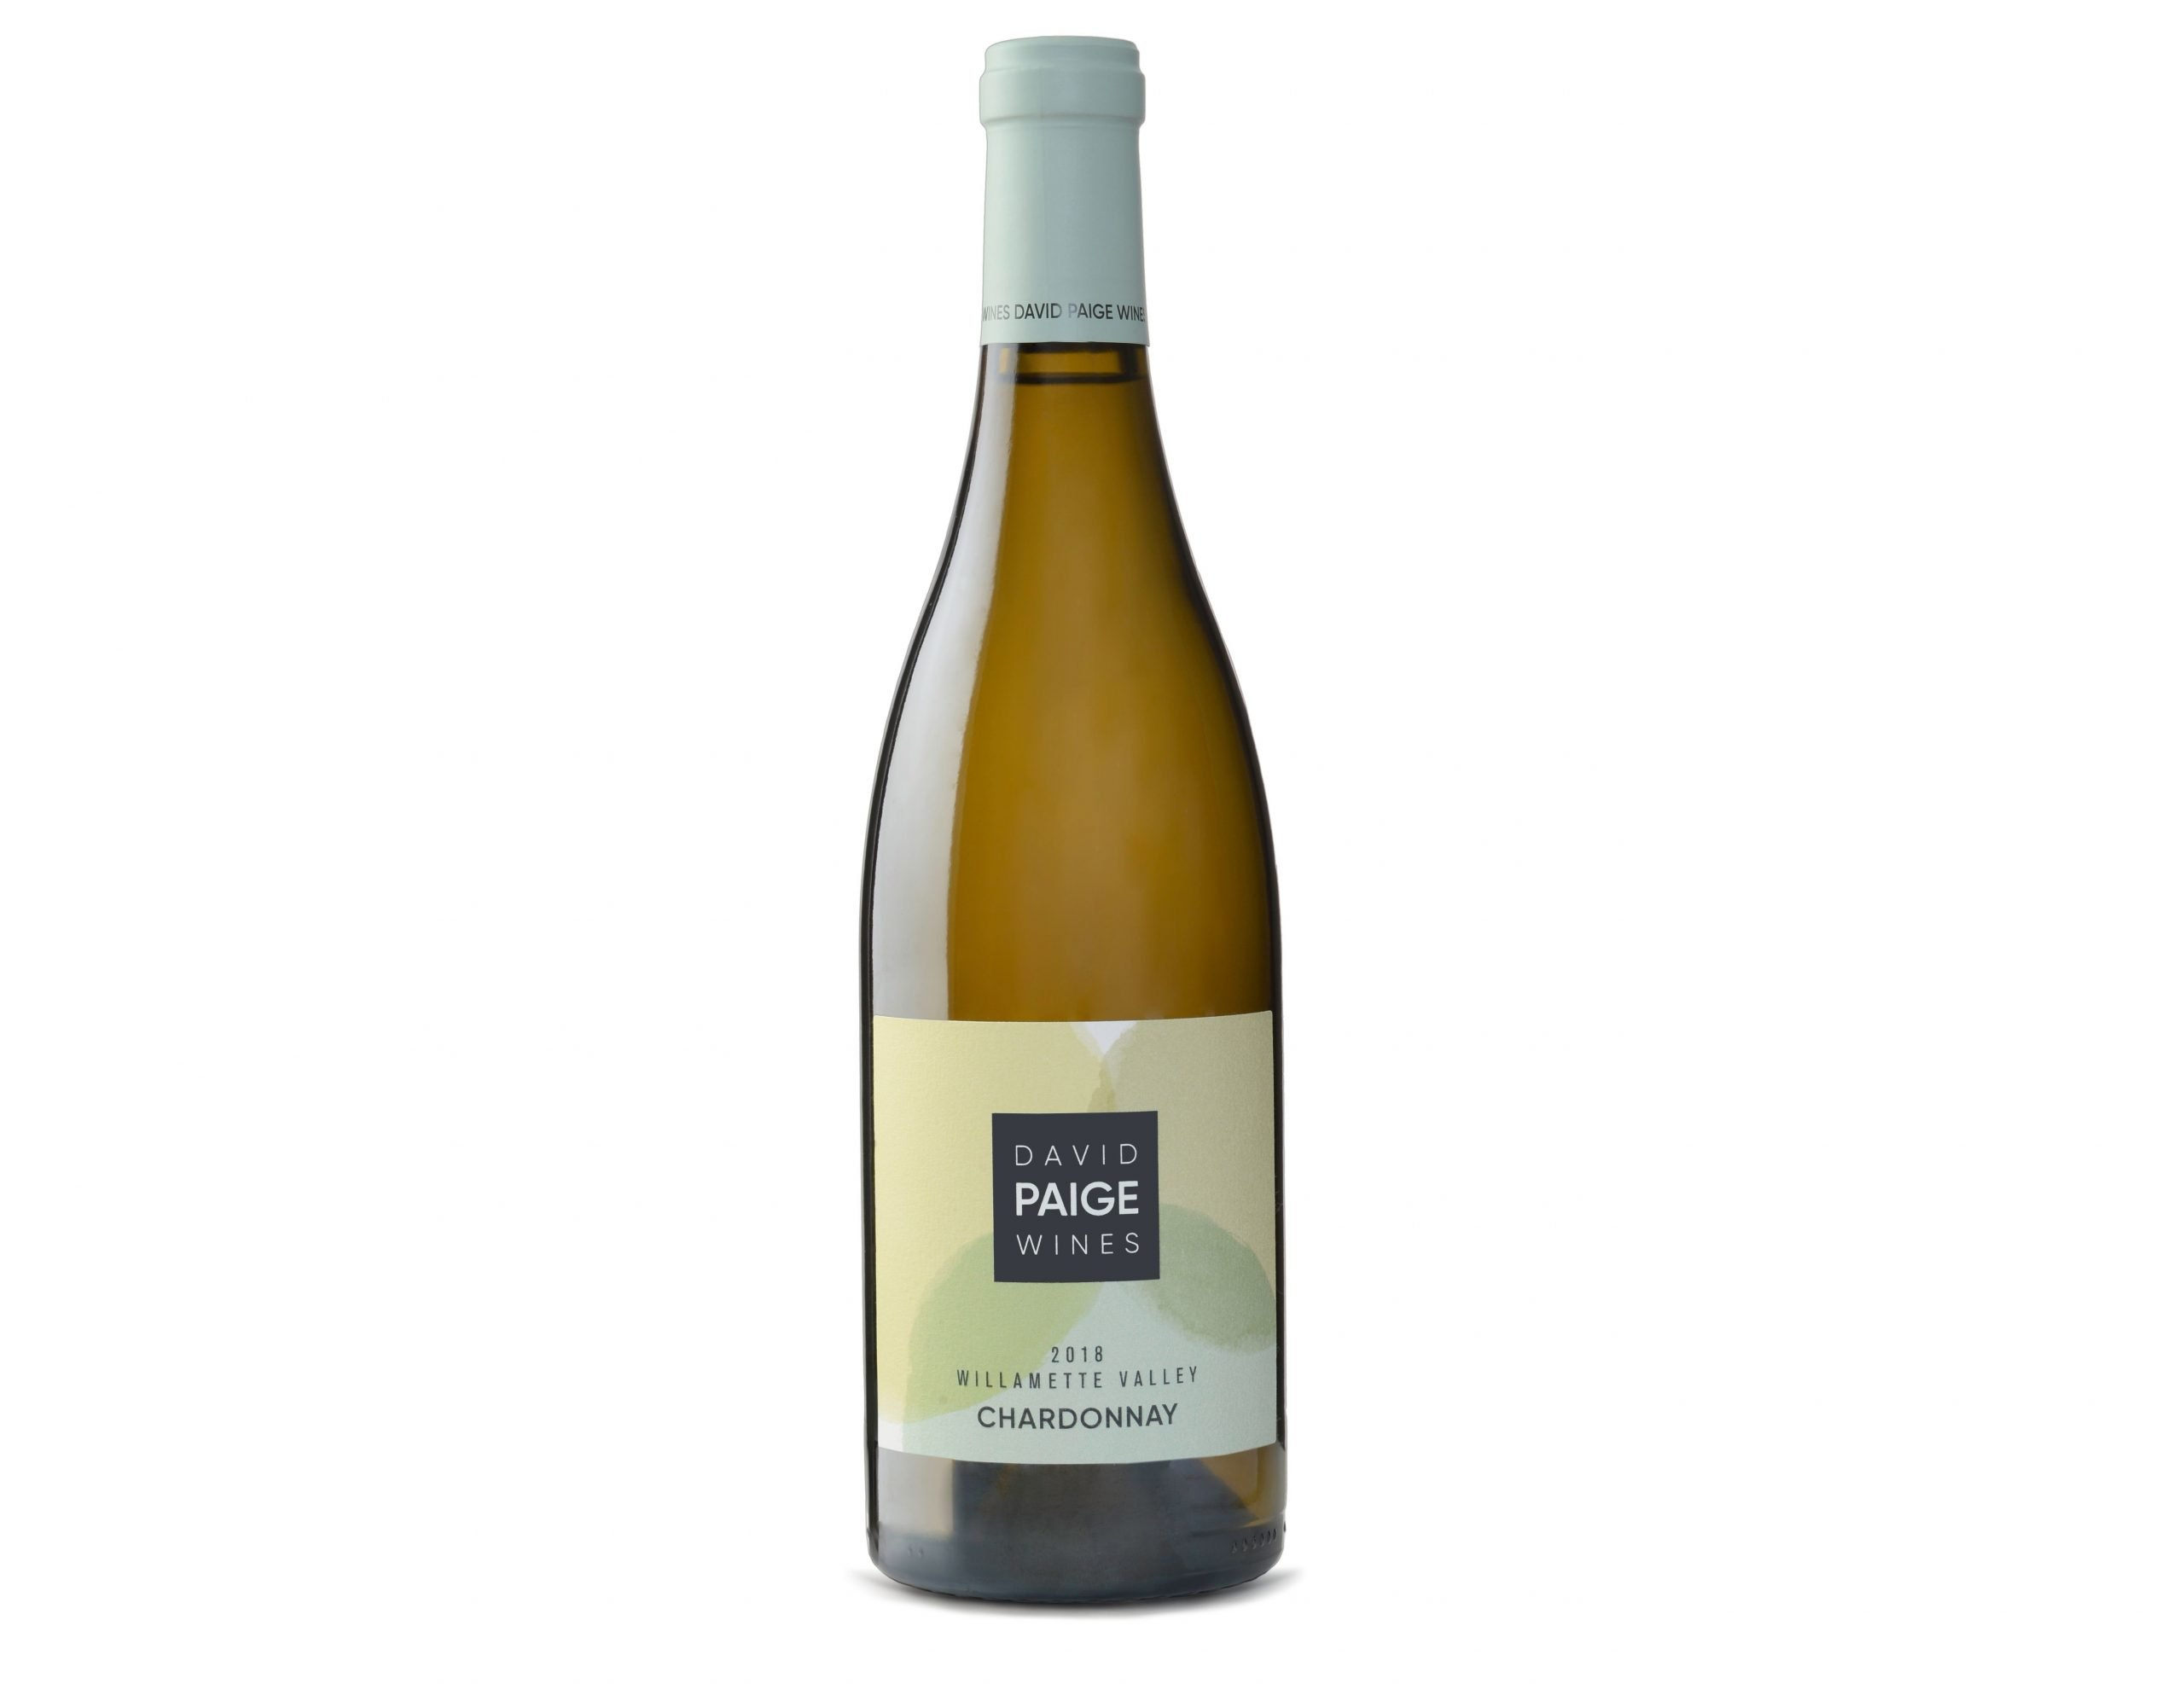 2018 David Paige Wines Chardonnay Willamette Valley